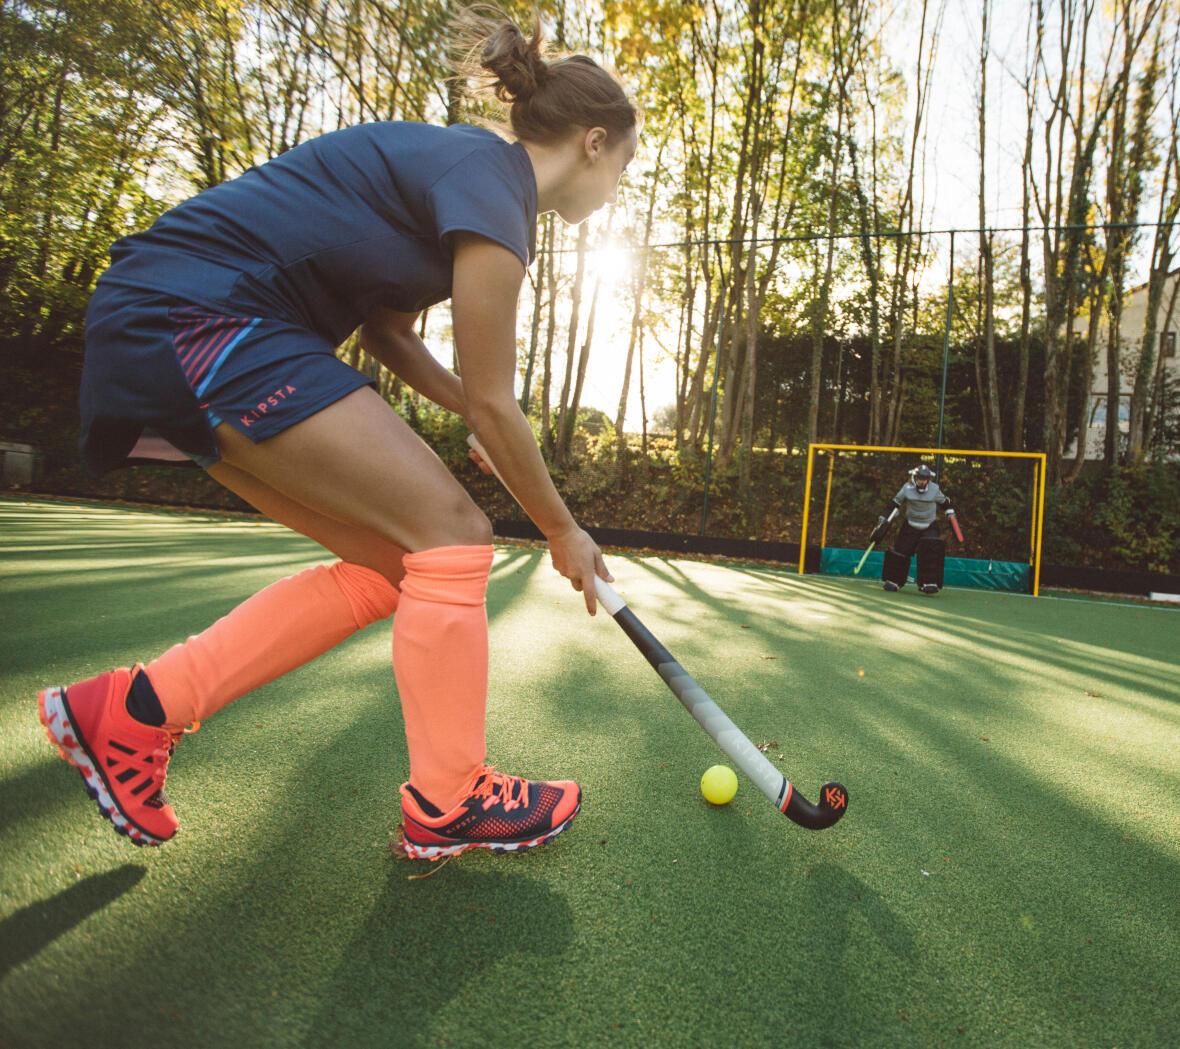 Arthrose et sport : le combo gagnant